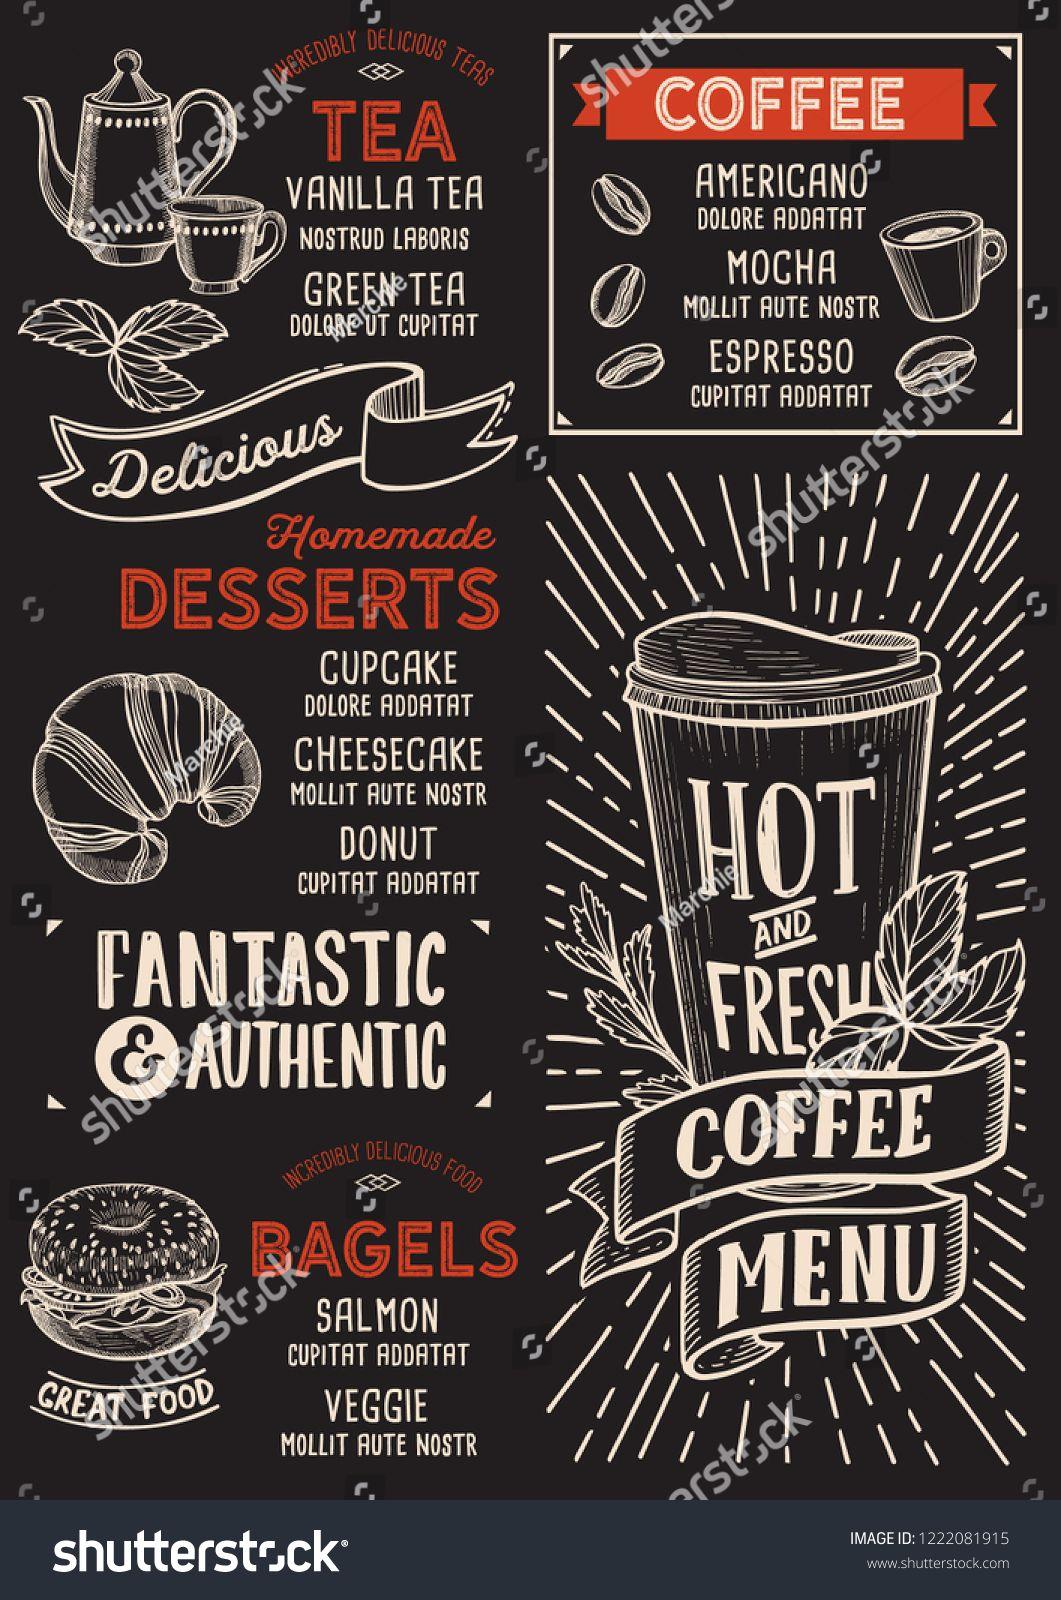 Coffee Menu Template For Restaurant On A Blackboard Background Vector Illustration Brochure For Food And Drink C Dizajn Menyu Kofejnye Illyustracii Melovaya Doska